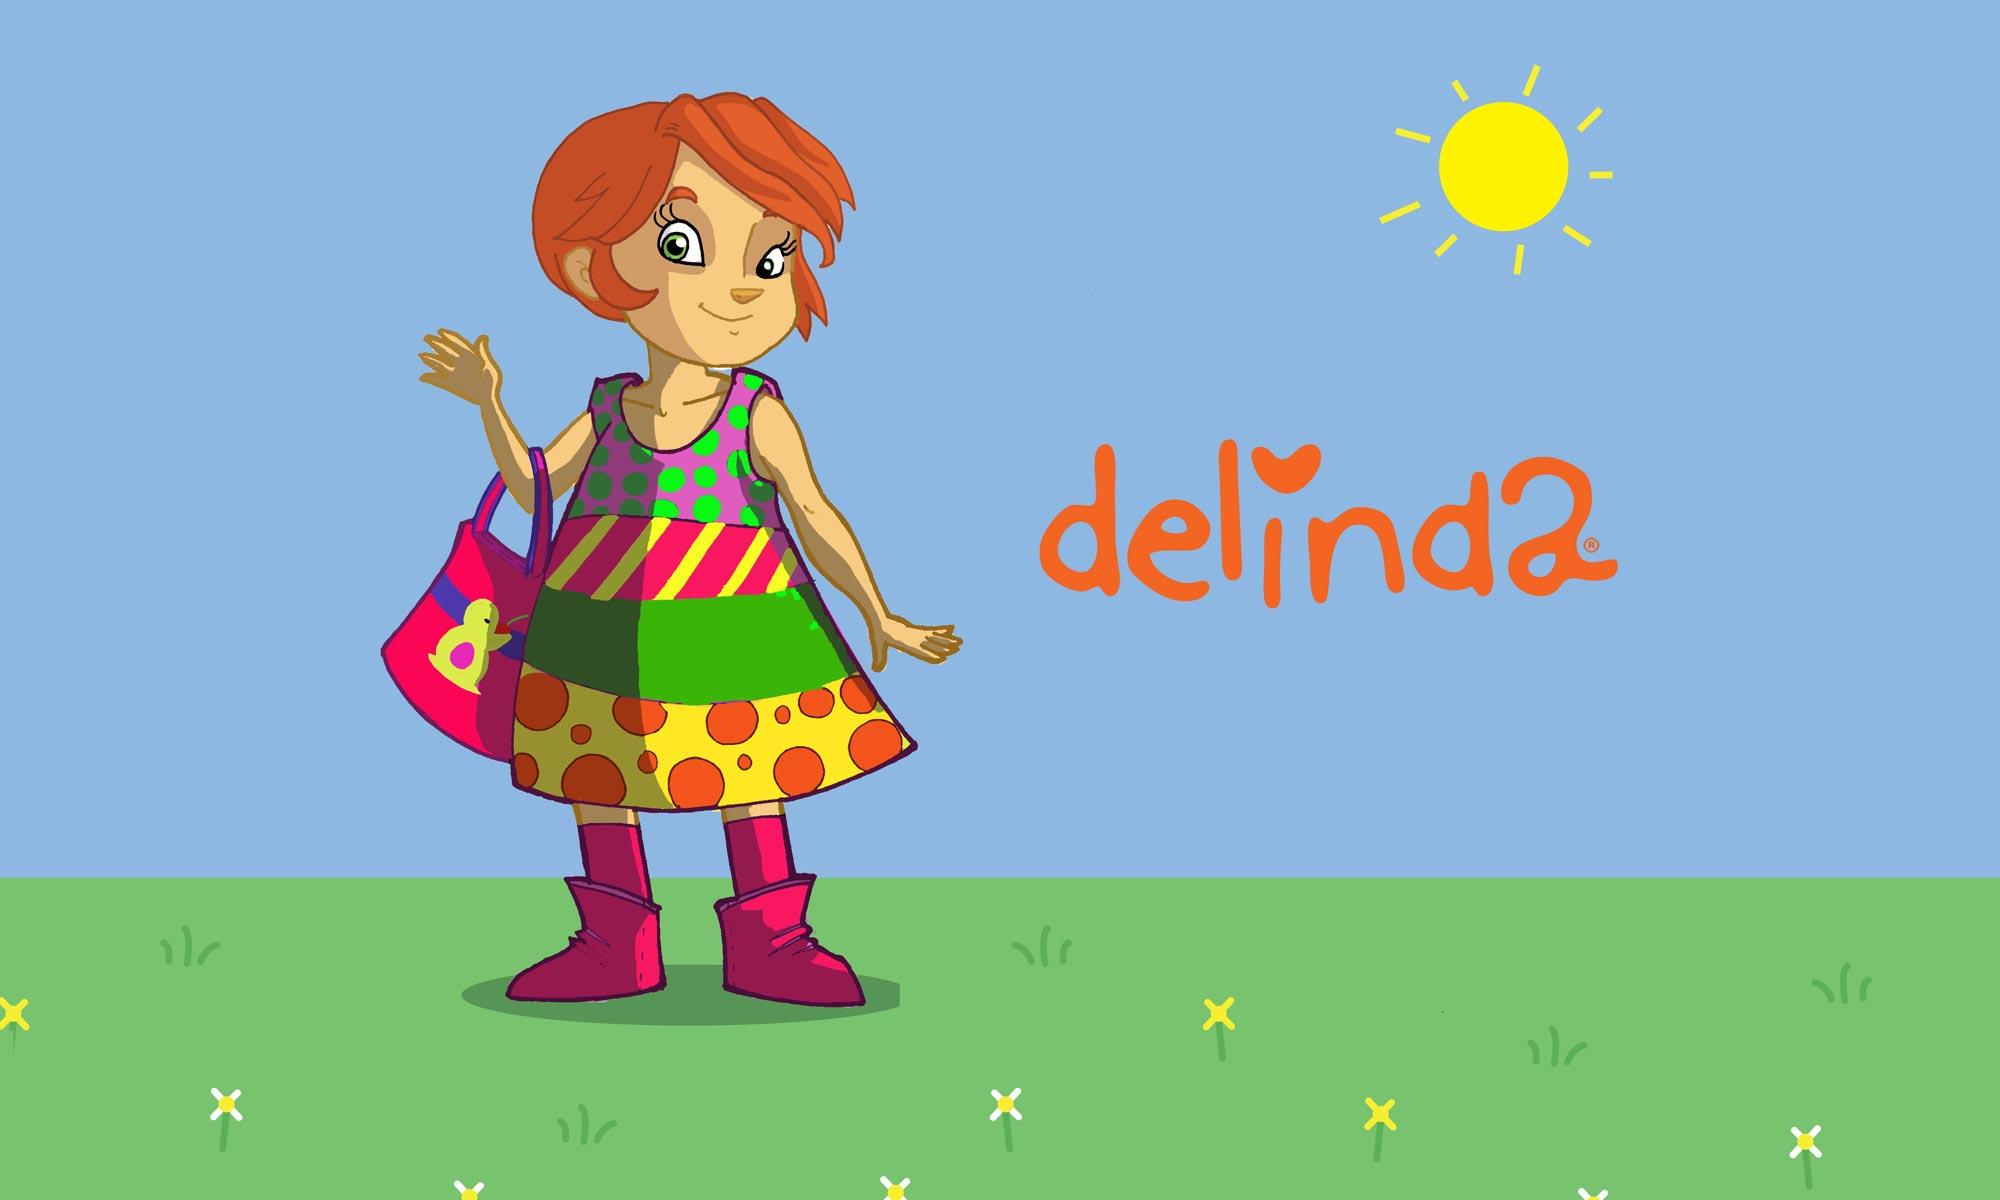 https://www.atelierzoz.com/wp-content/uploads/2020/03/works_delinda-2.jpg